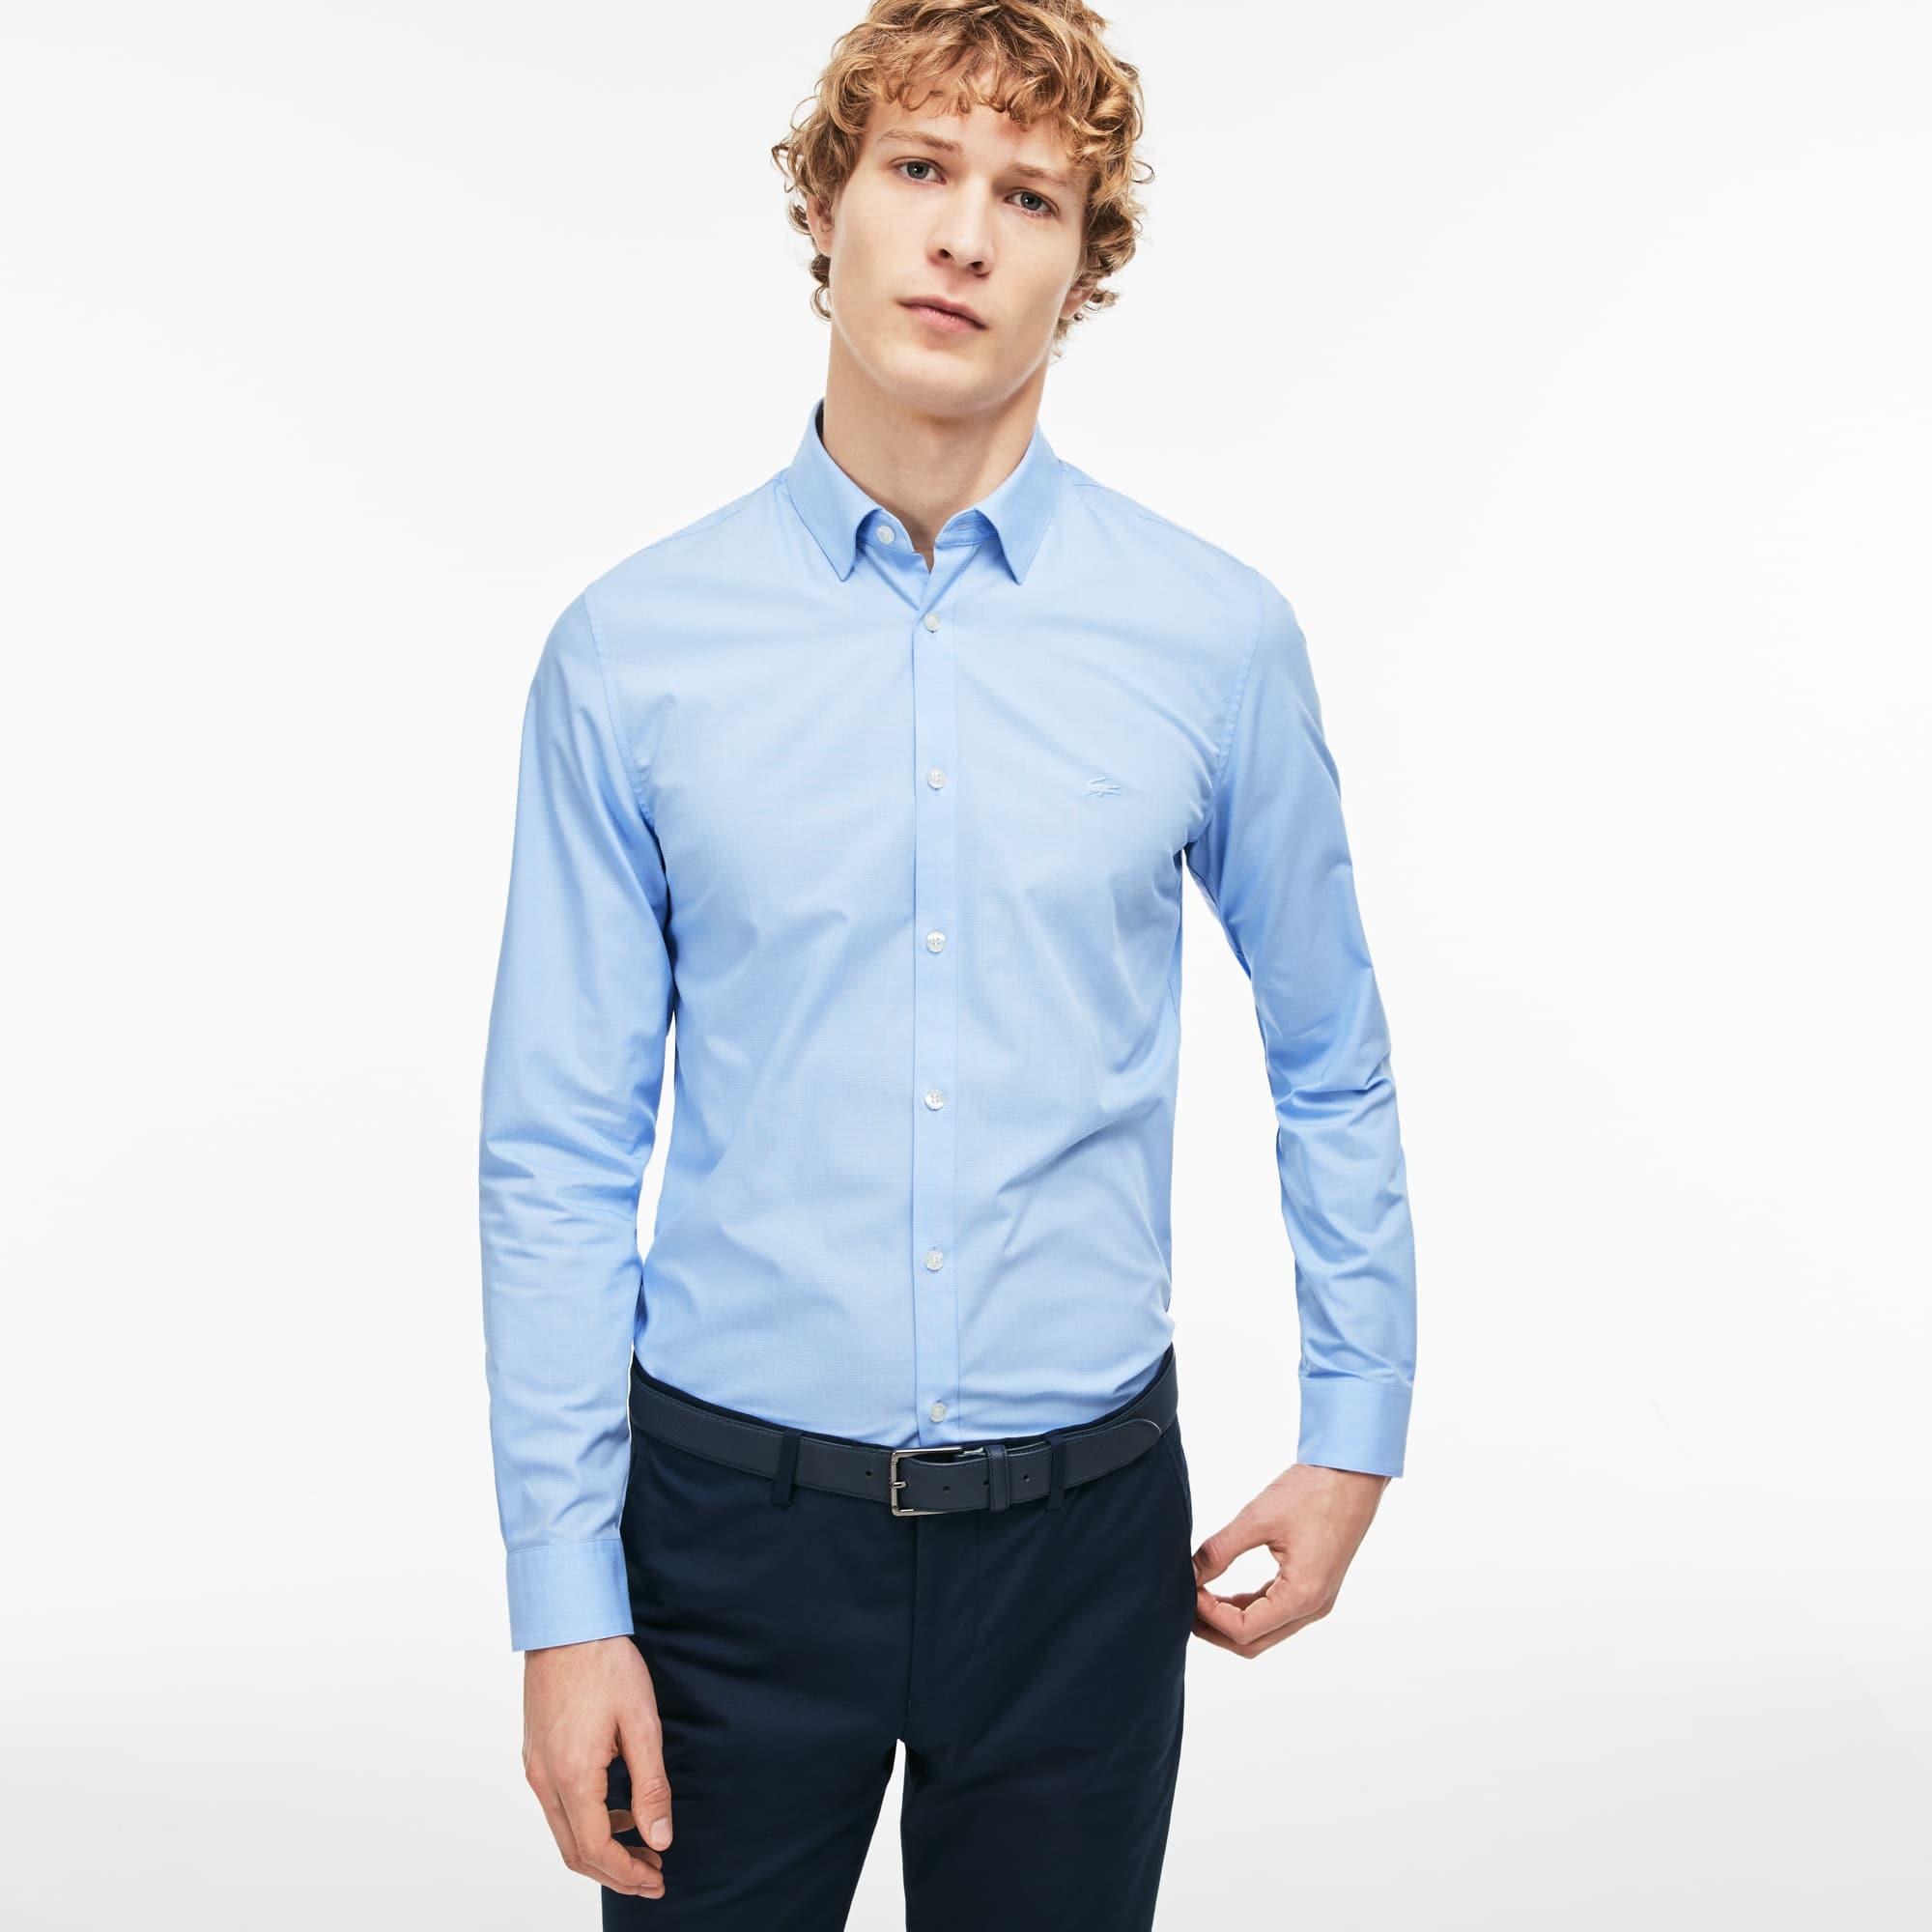 Slim Fit Herren-Hemd aus gestreifter Jacquard-Popeline